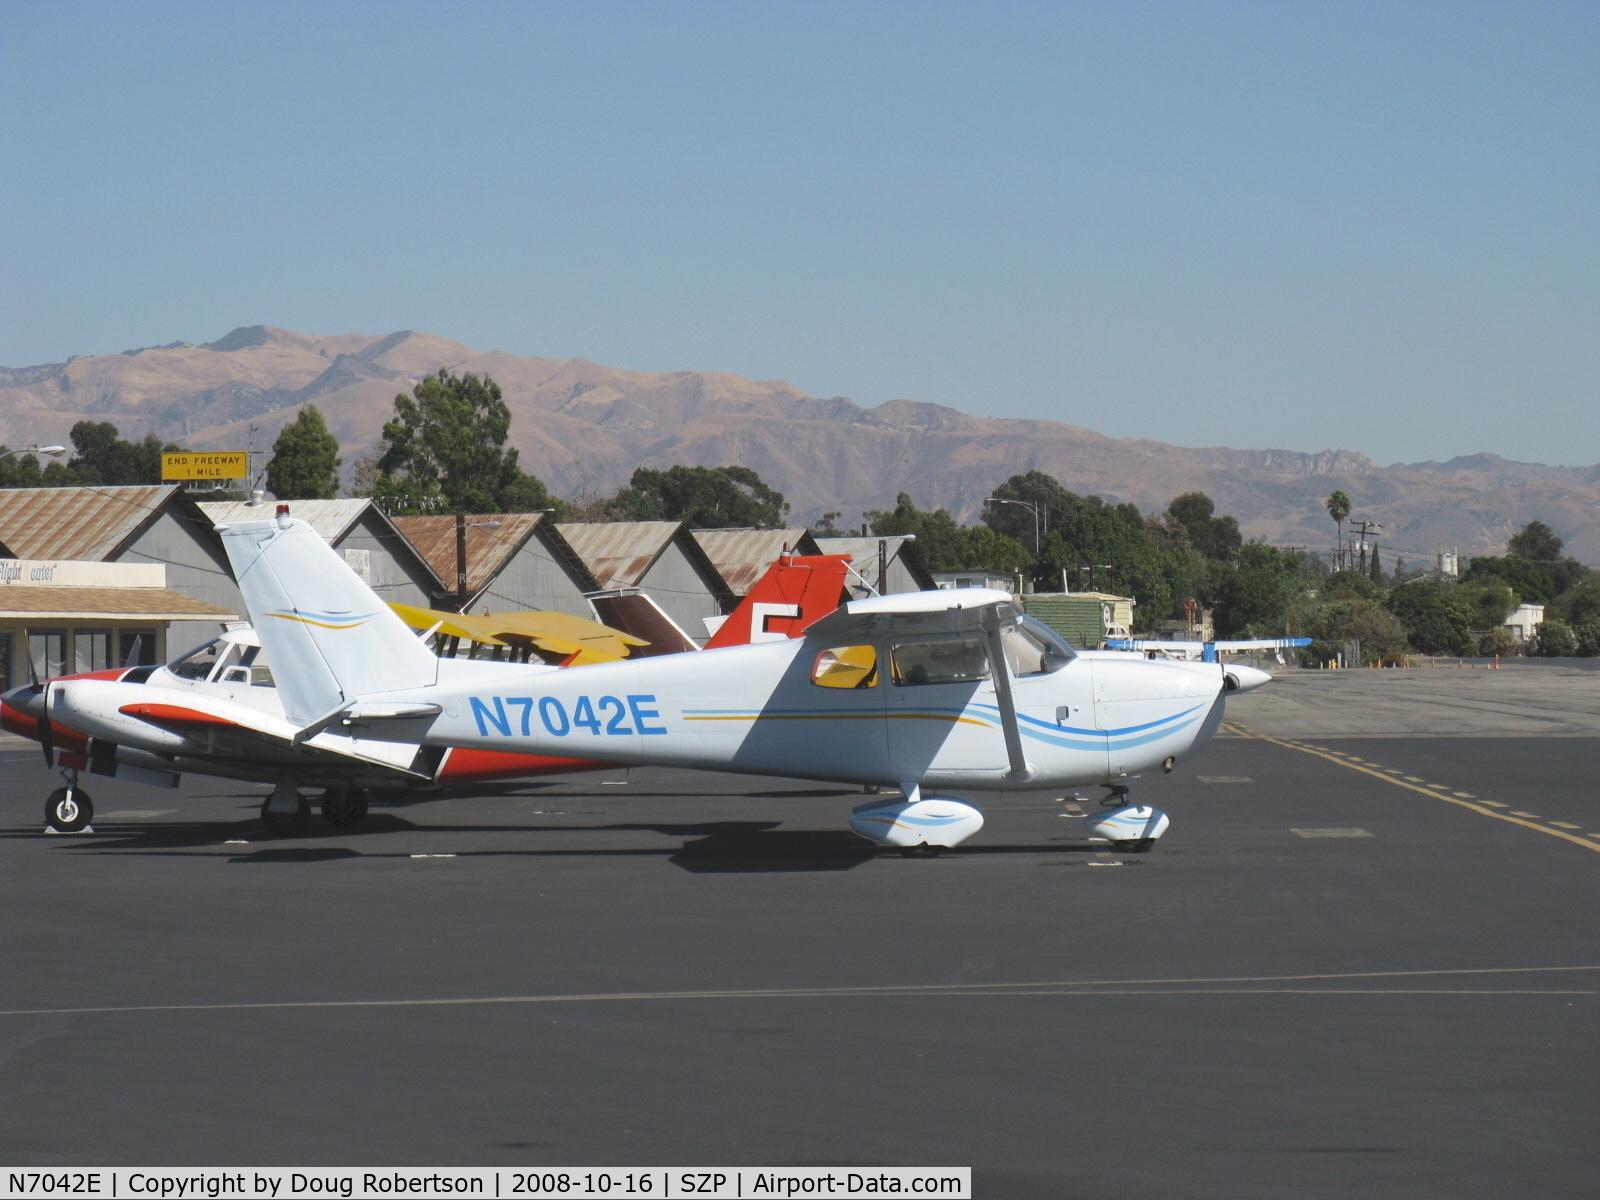 N7042E, 1960 Cessna 175A Skylark C/N 56542, 1960 Cessna 175 SKYLARK, Continental GO-300-E 175 Hp